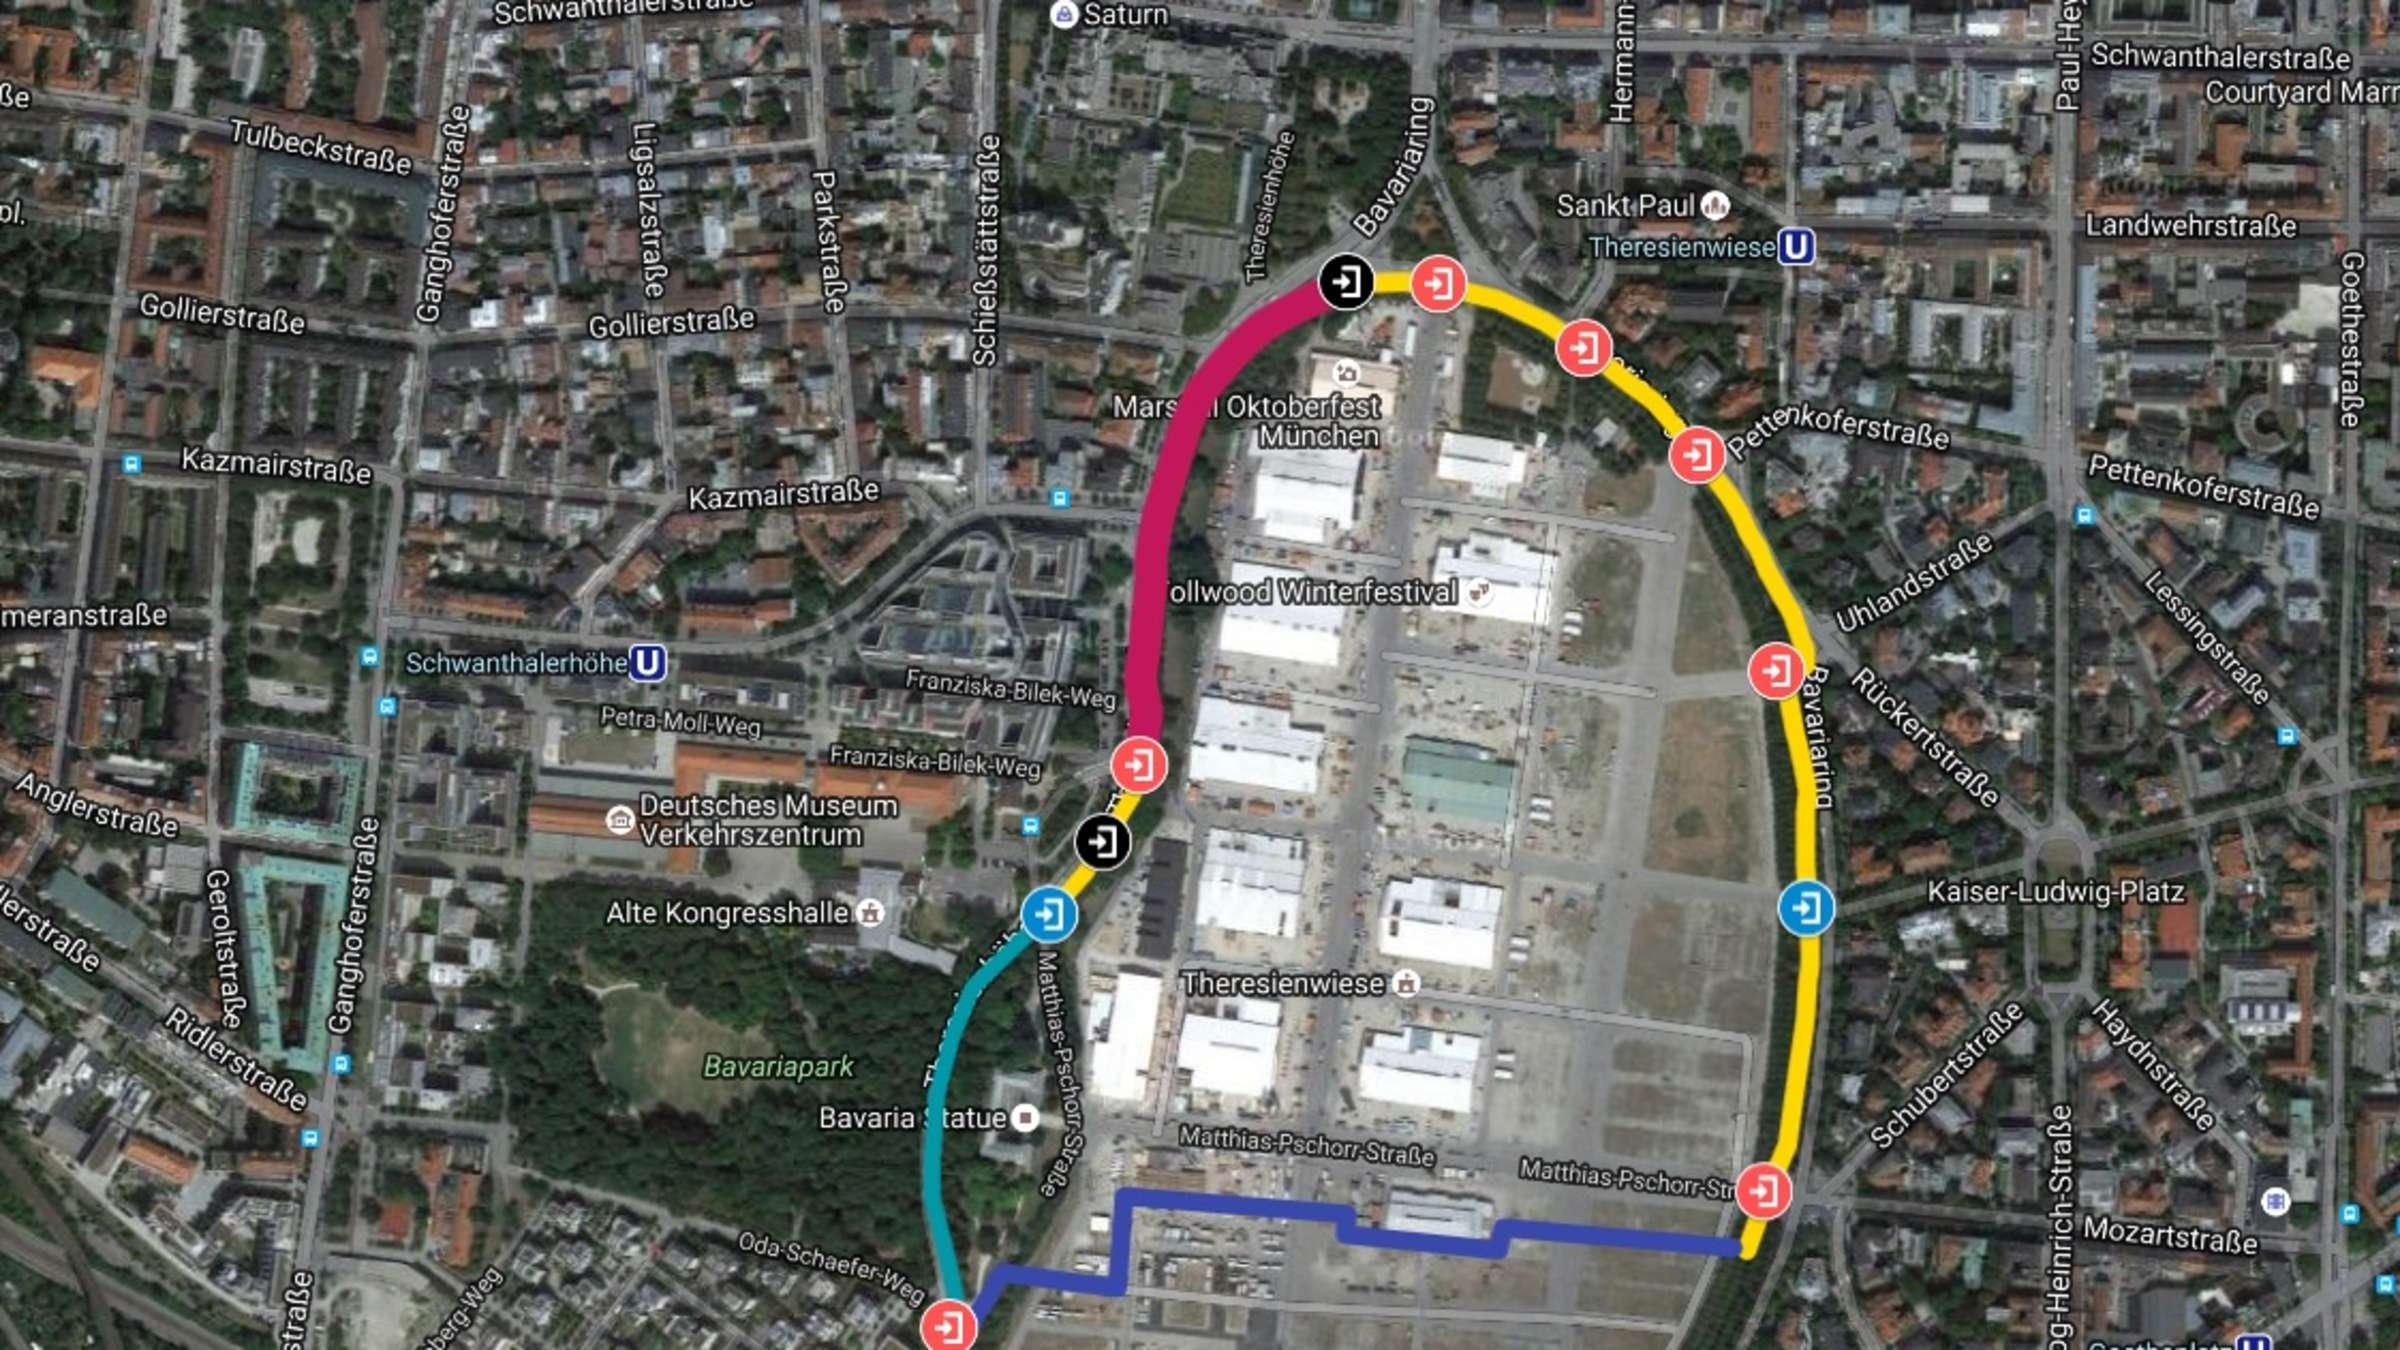 Oktoberfest 2016 Interaktive Karte Wir Erklaren Den Wiesn Zaun